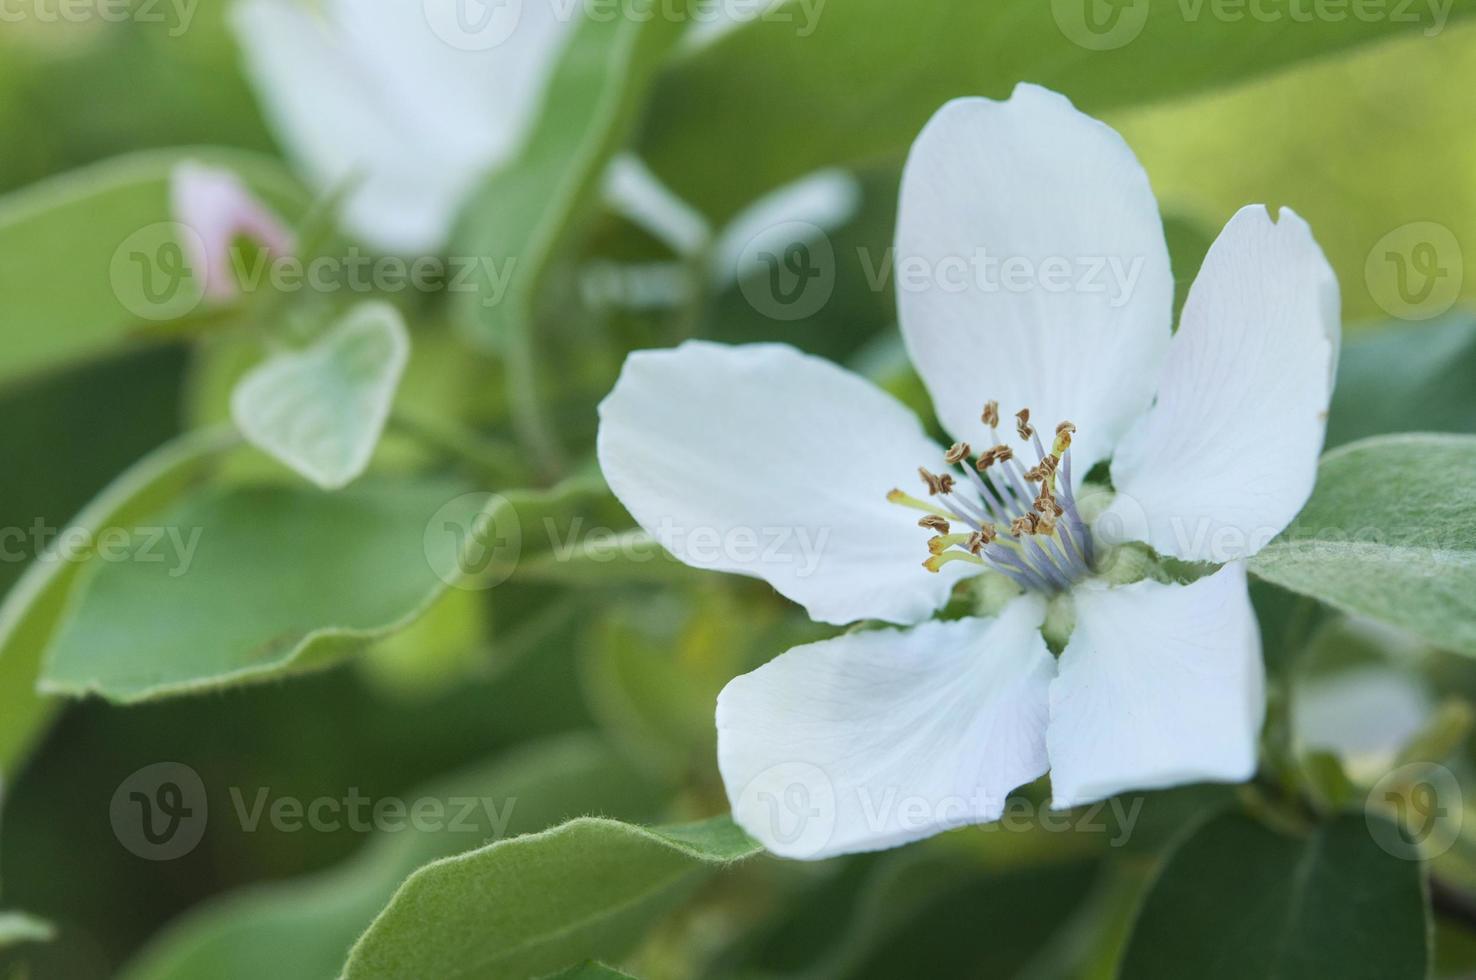 flores de membrillo de cerca foto